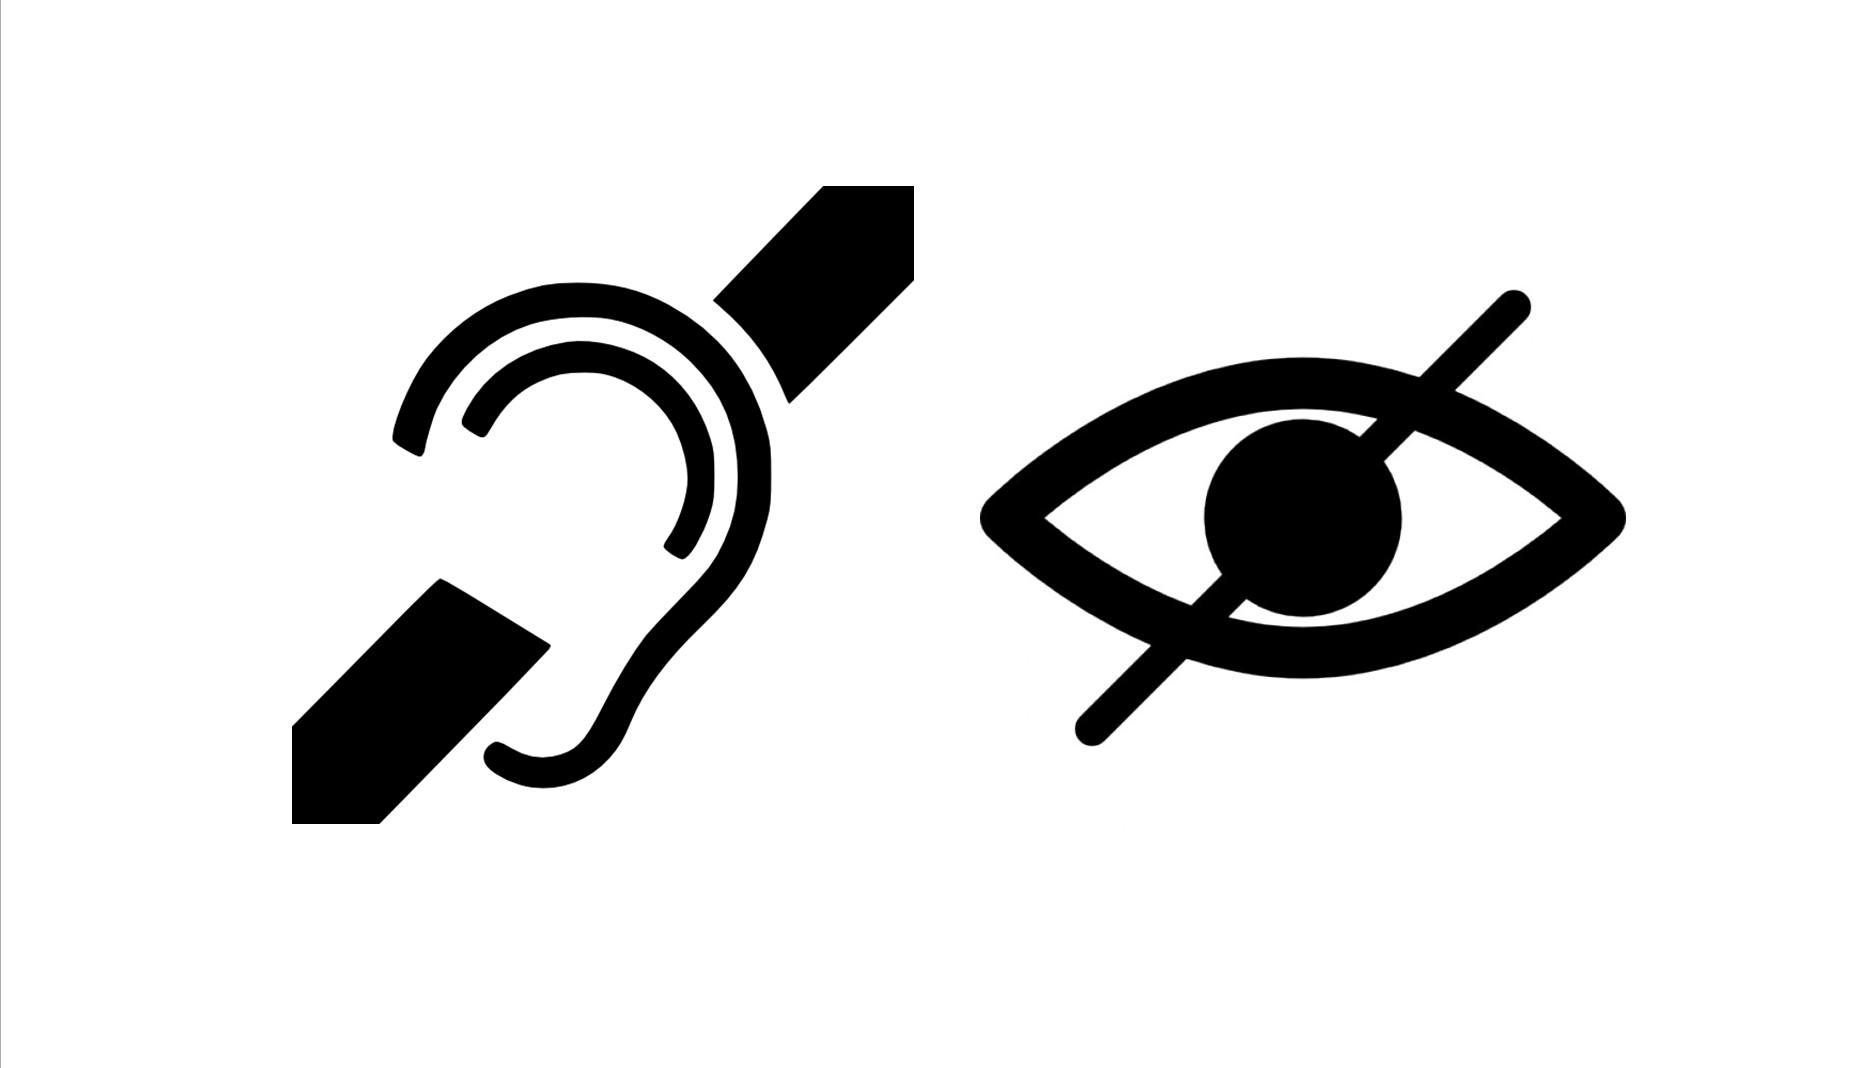 #Disabilityawareness: Deafblind